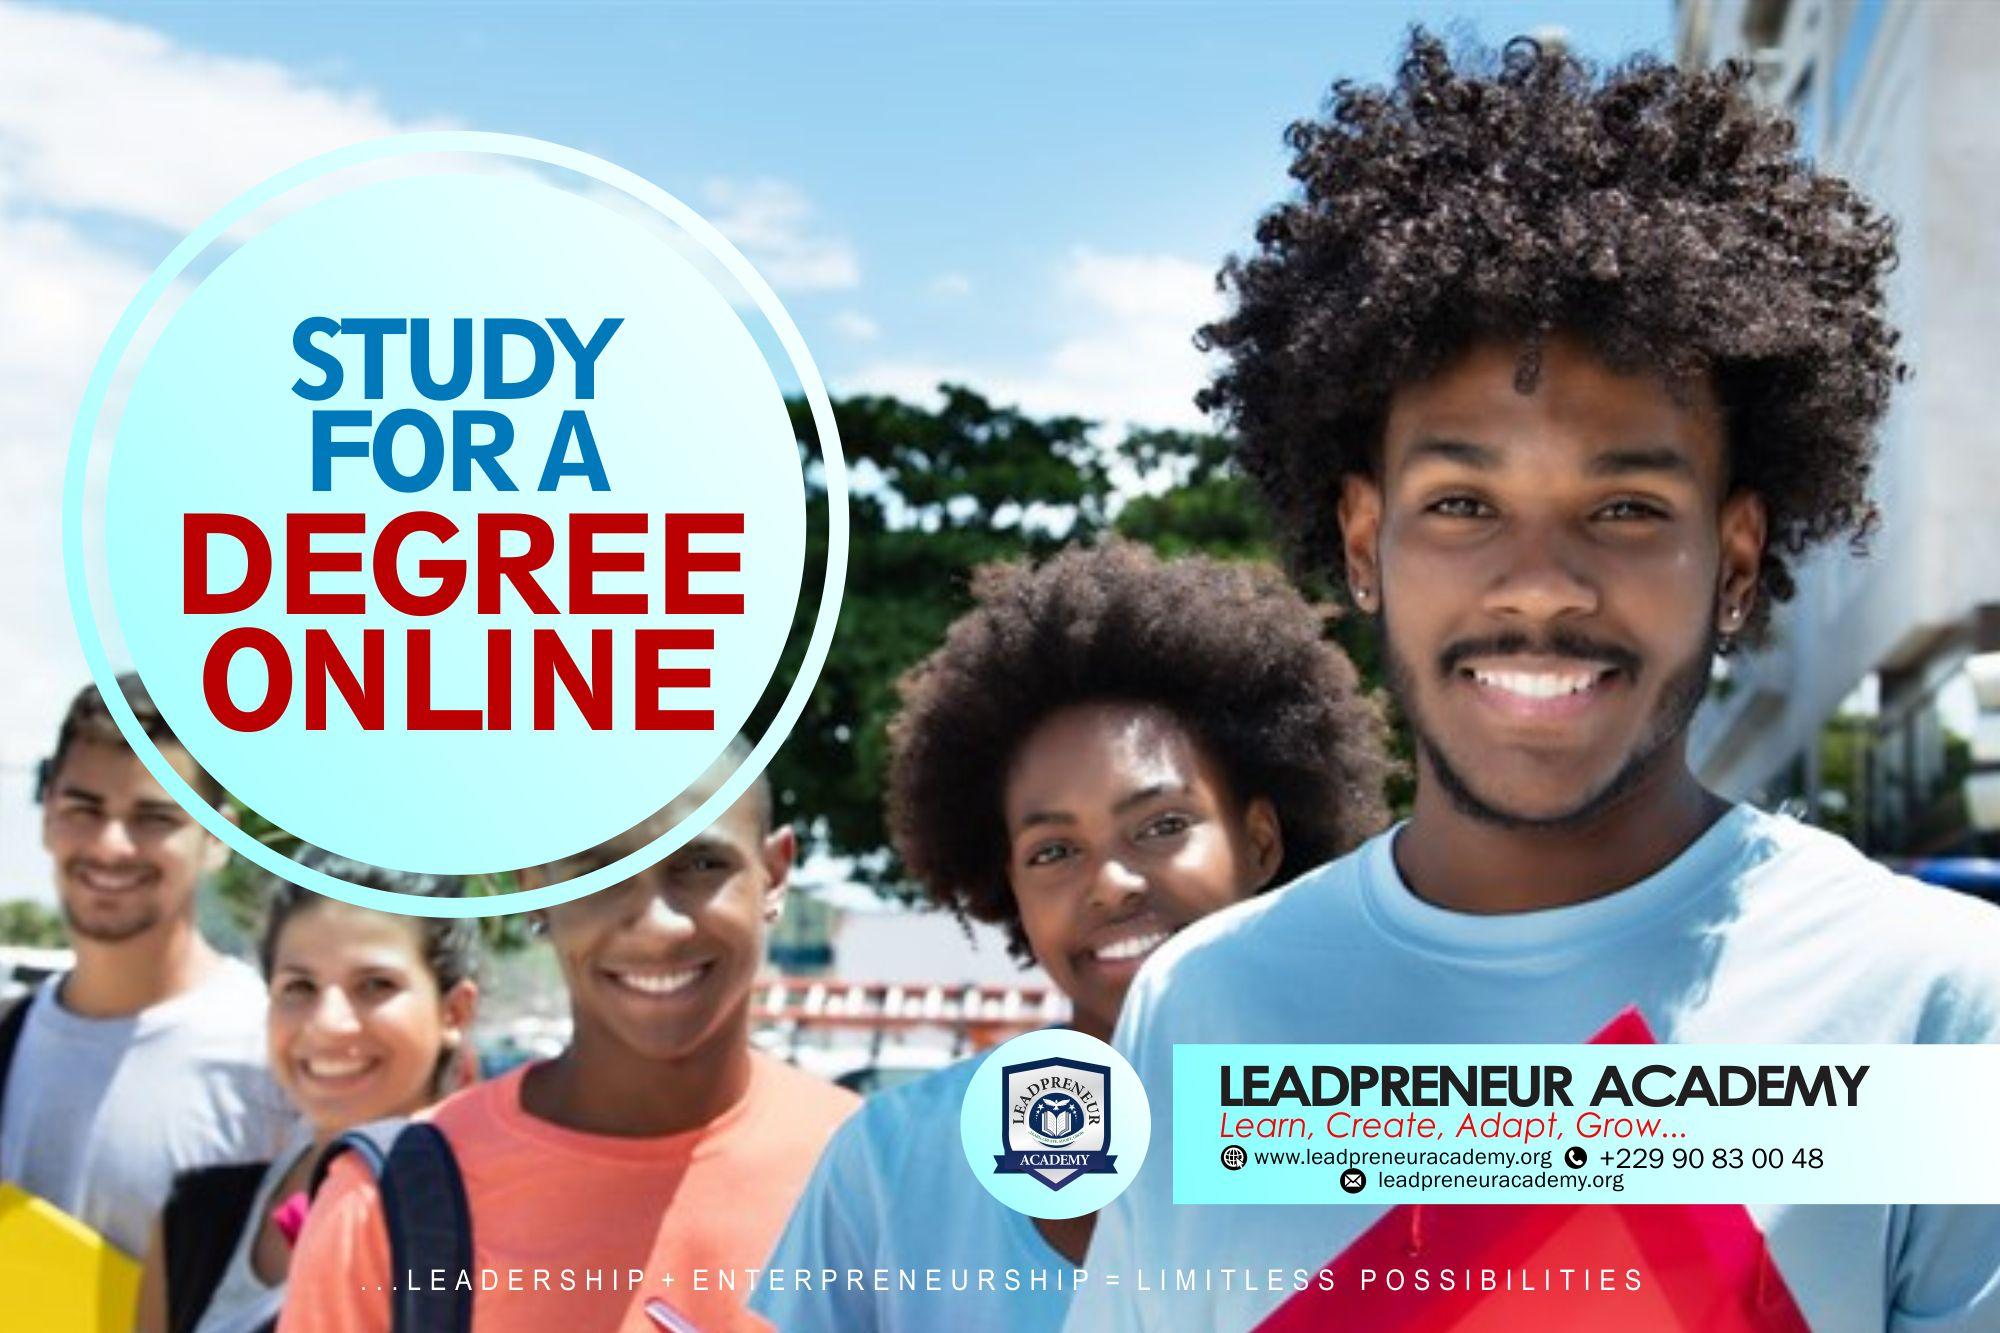 online degree leadpreneur academy